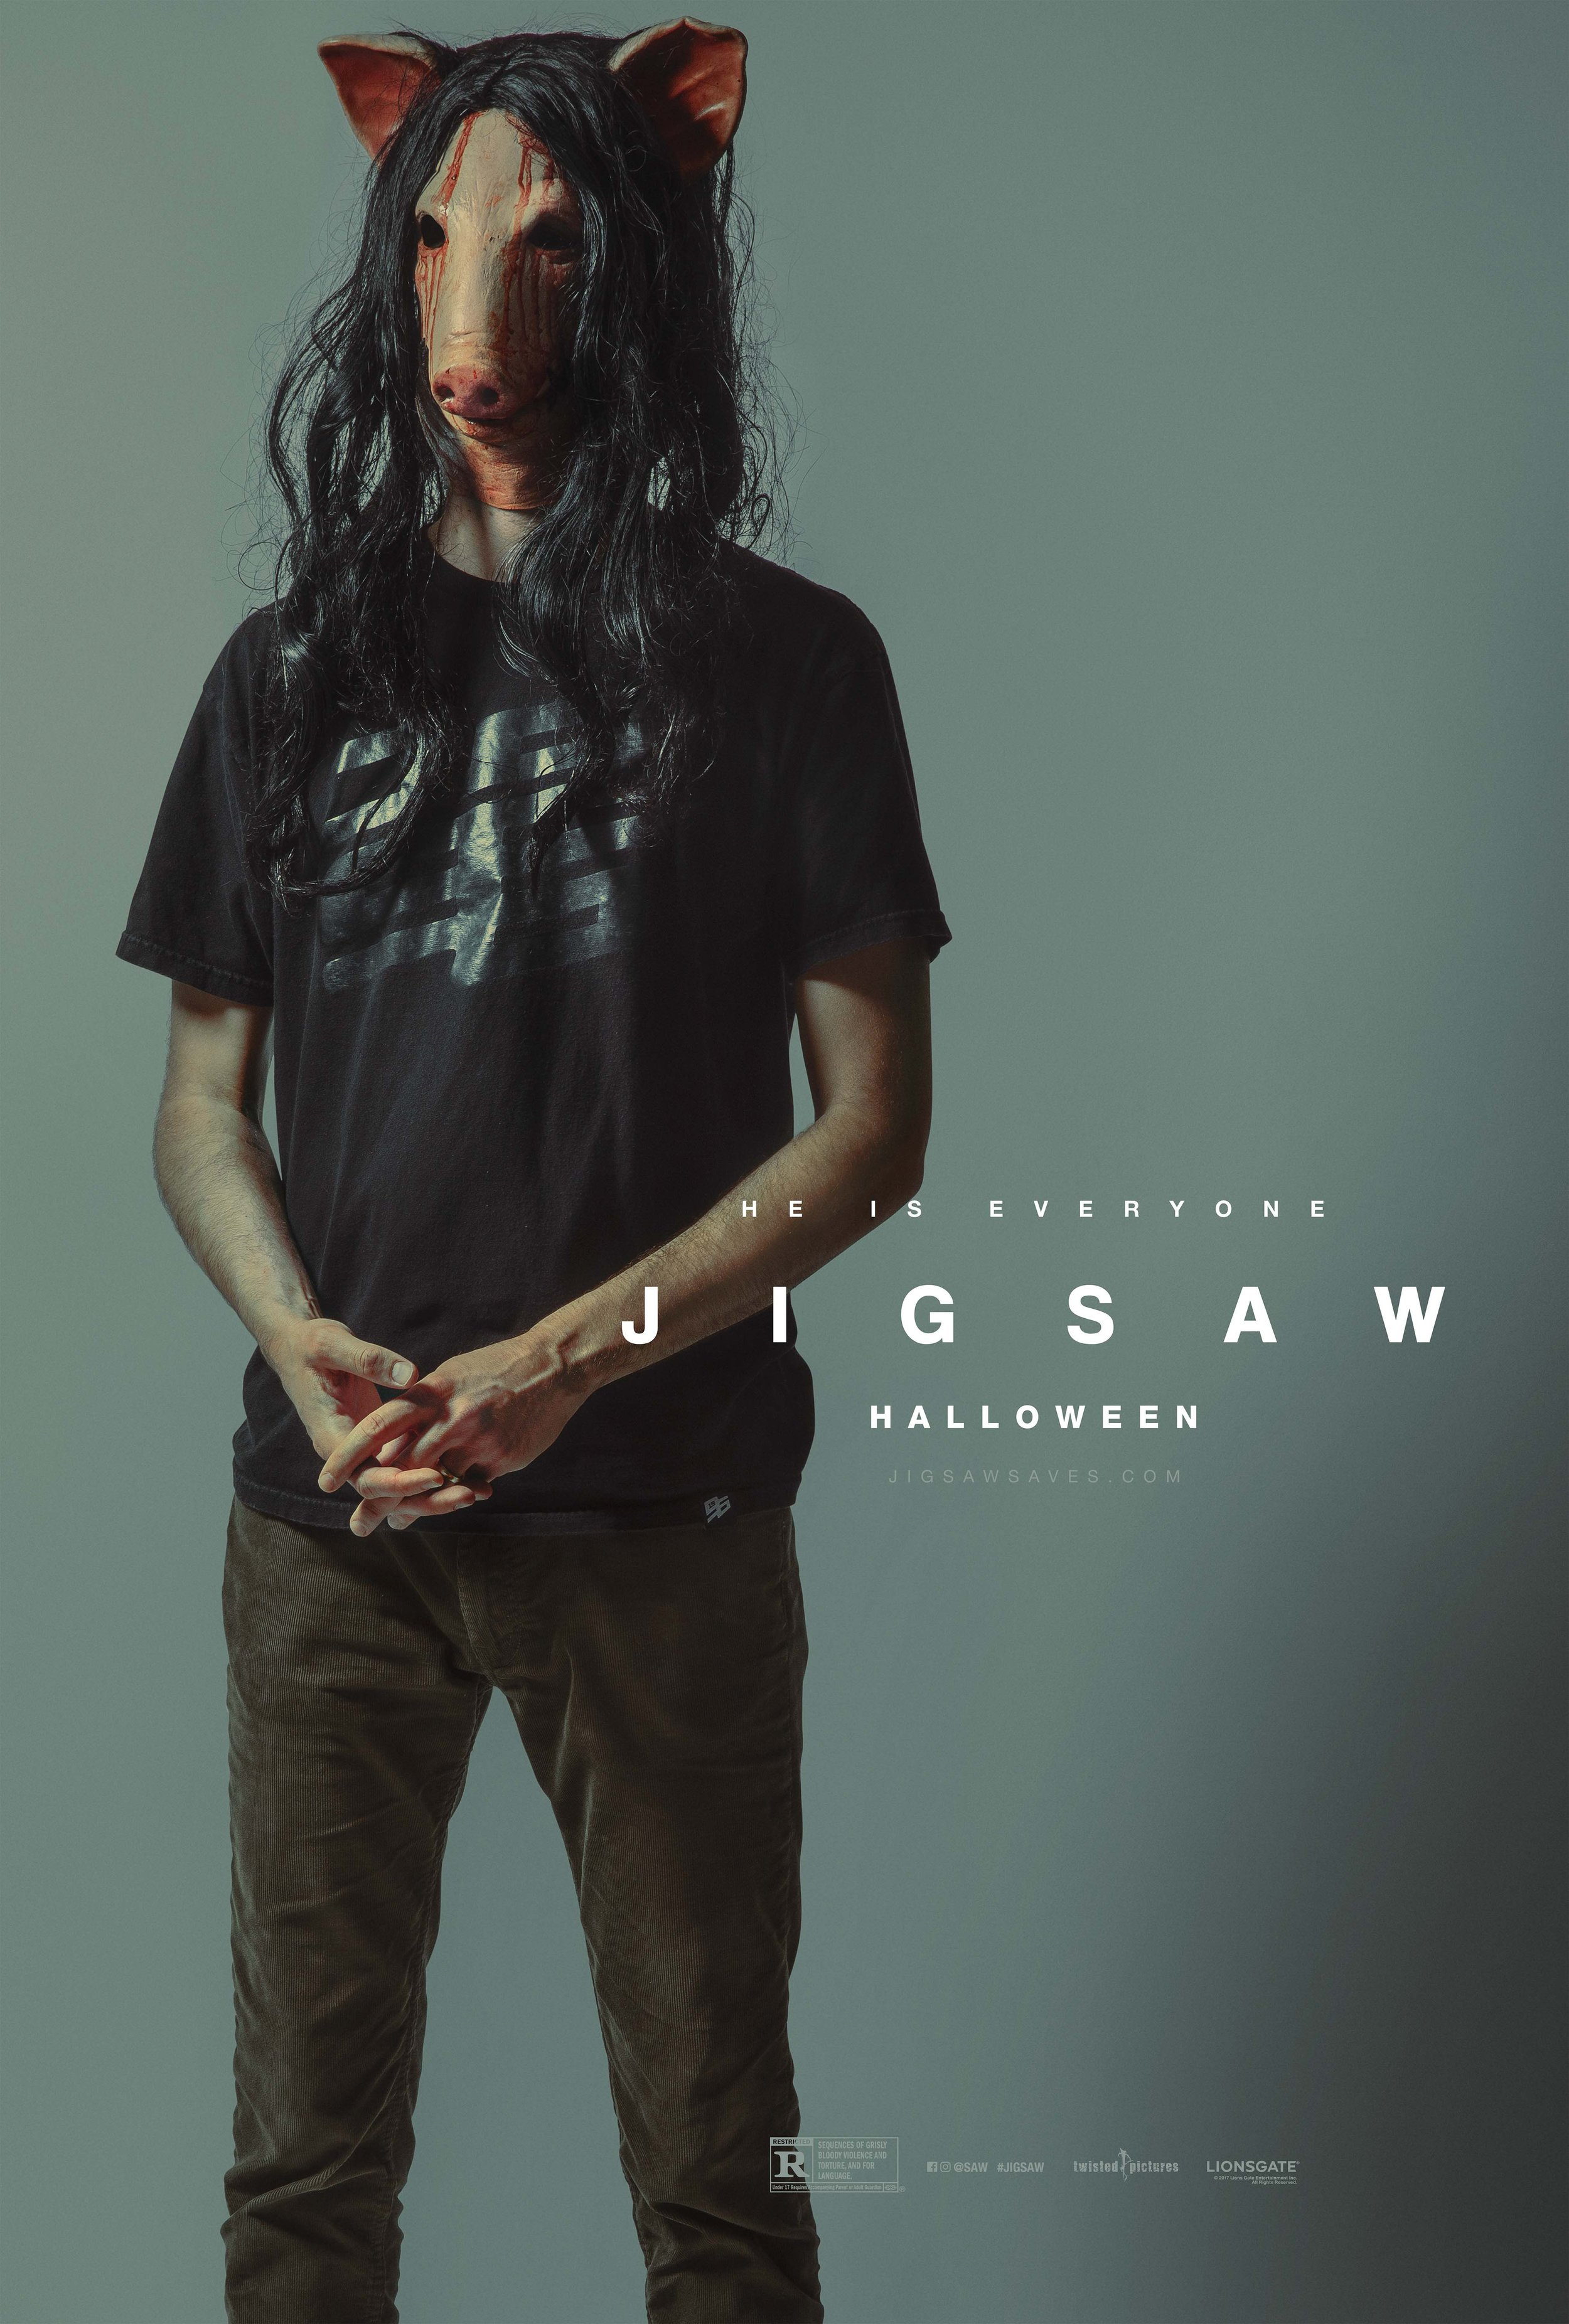 Jigsaw: He is Everyone